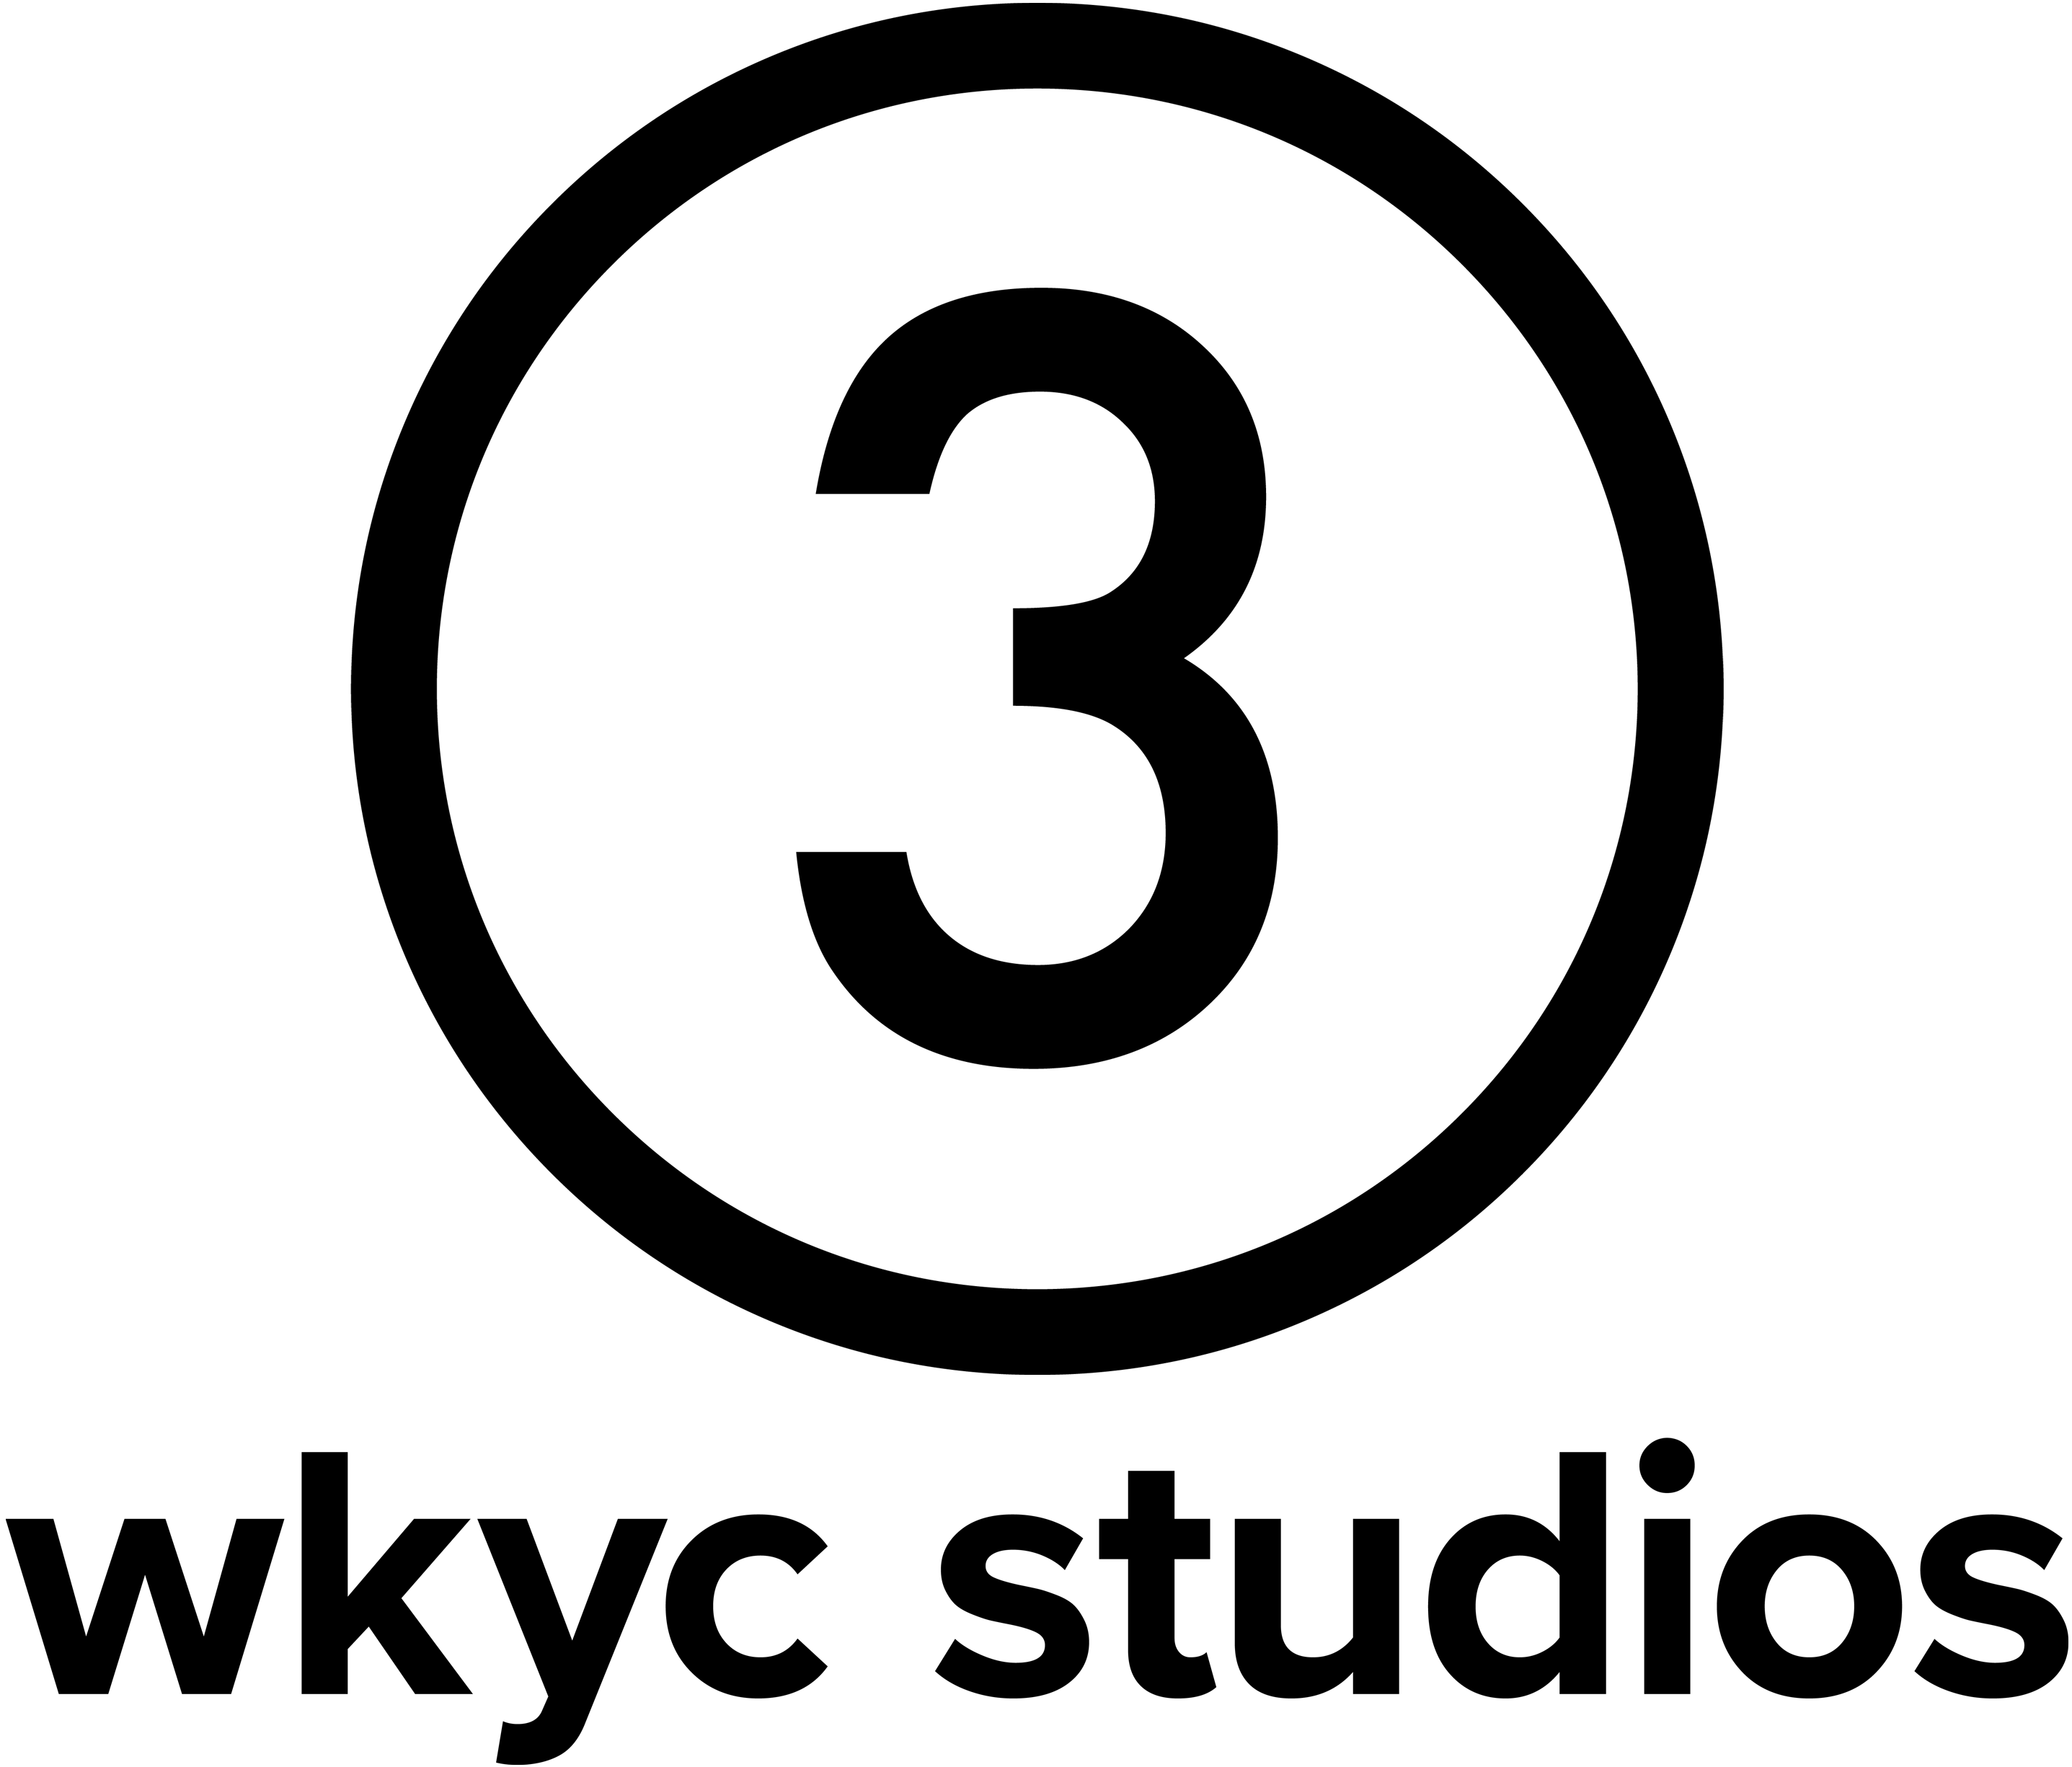 3 studios logo - Black